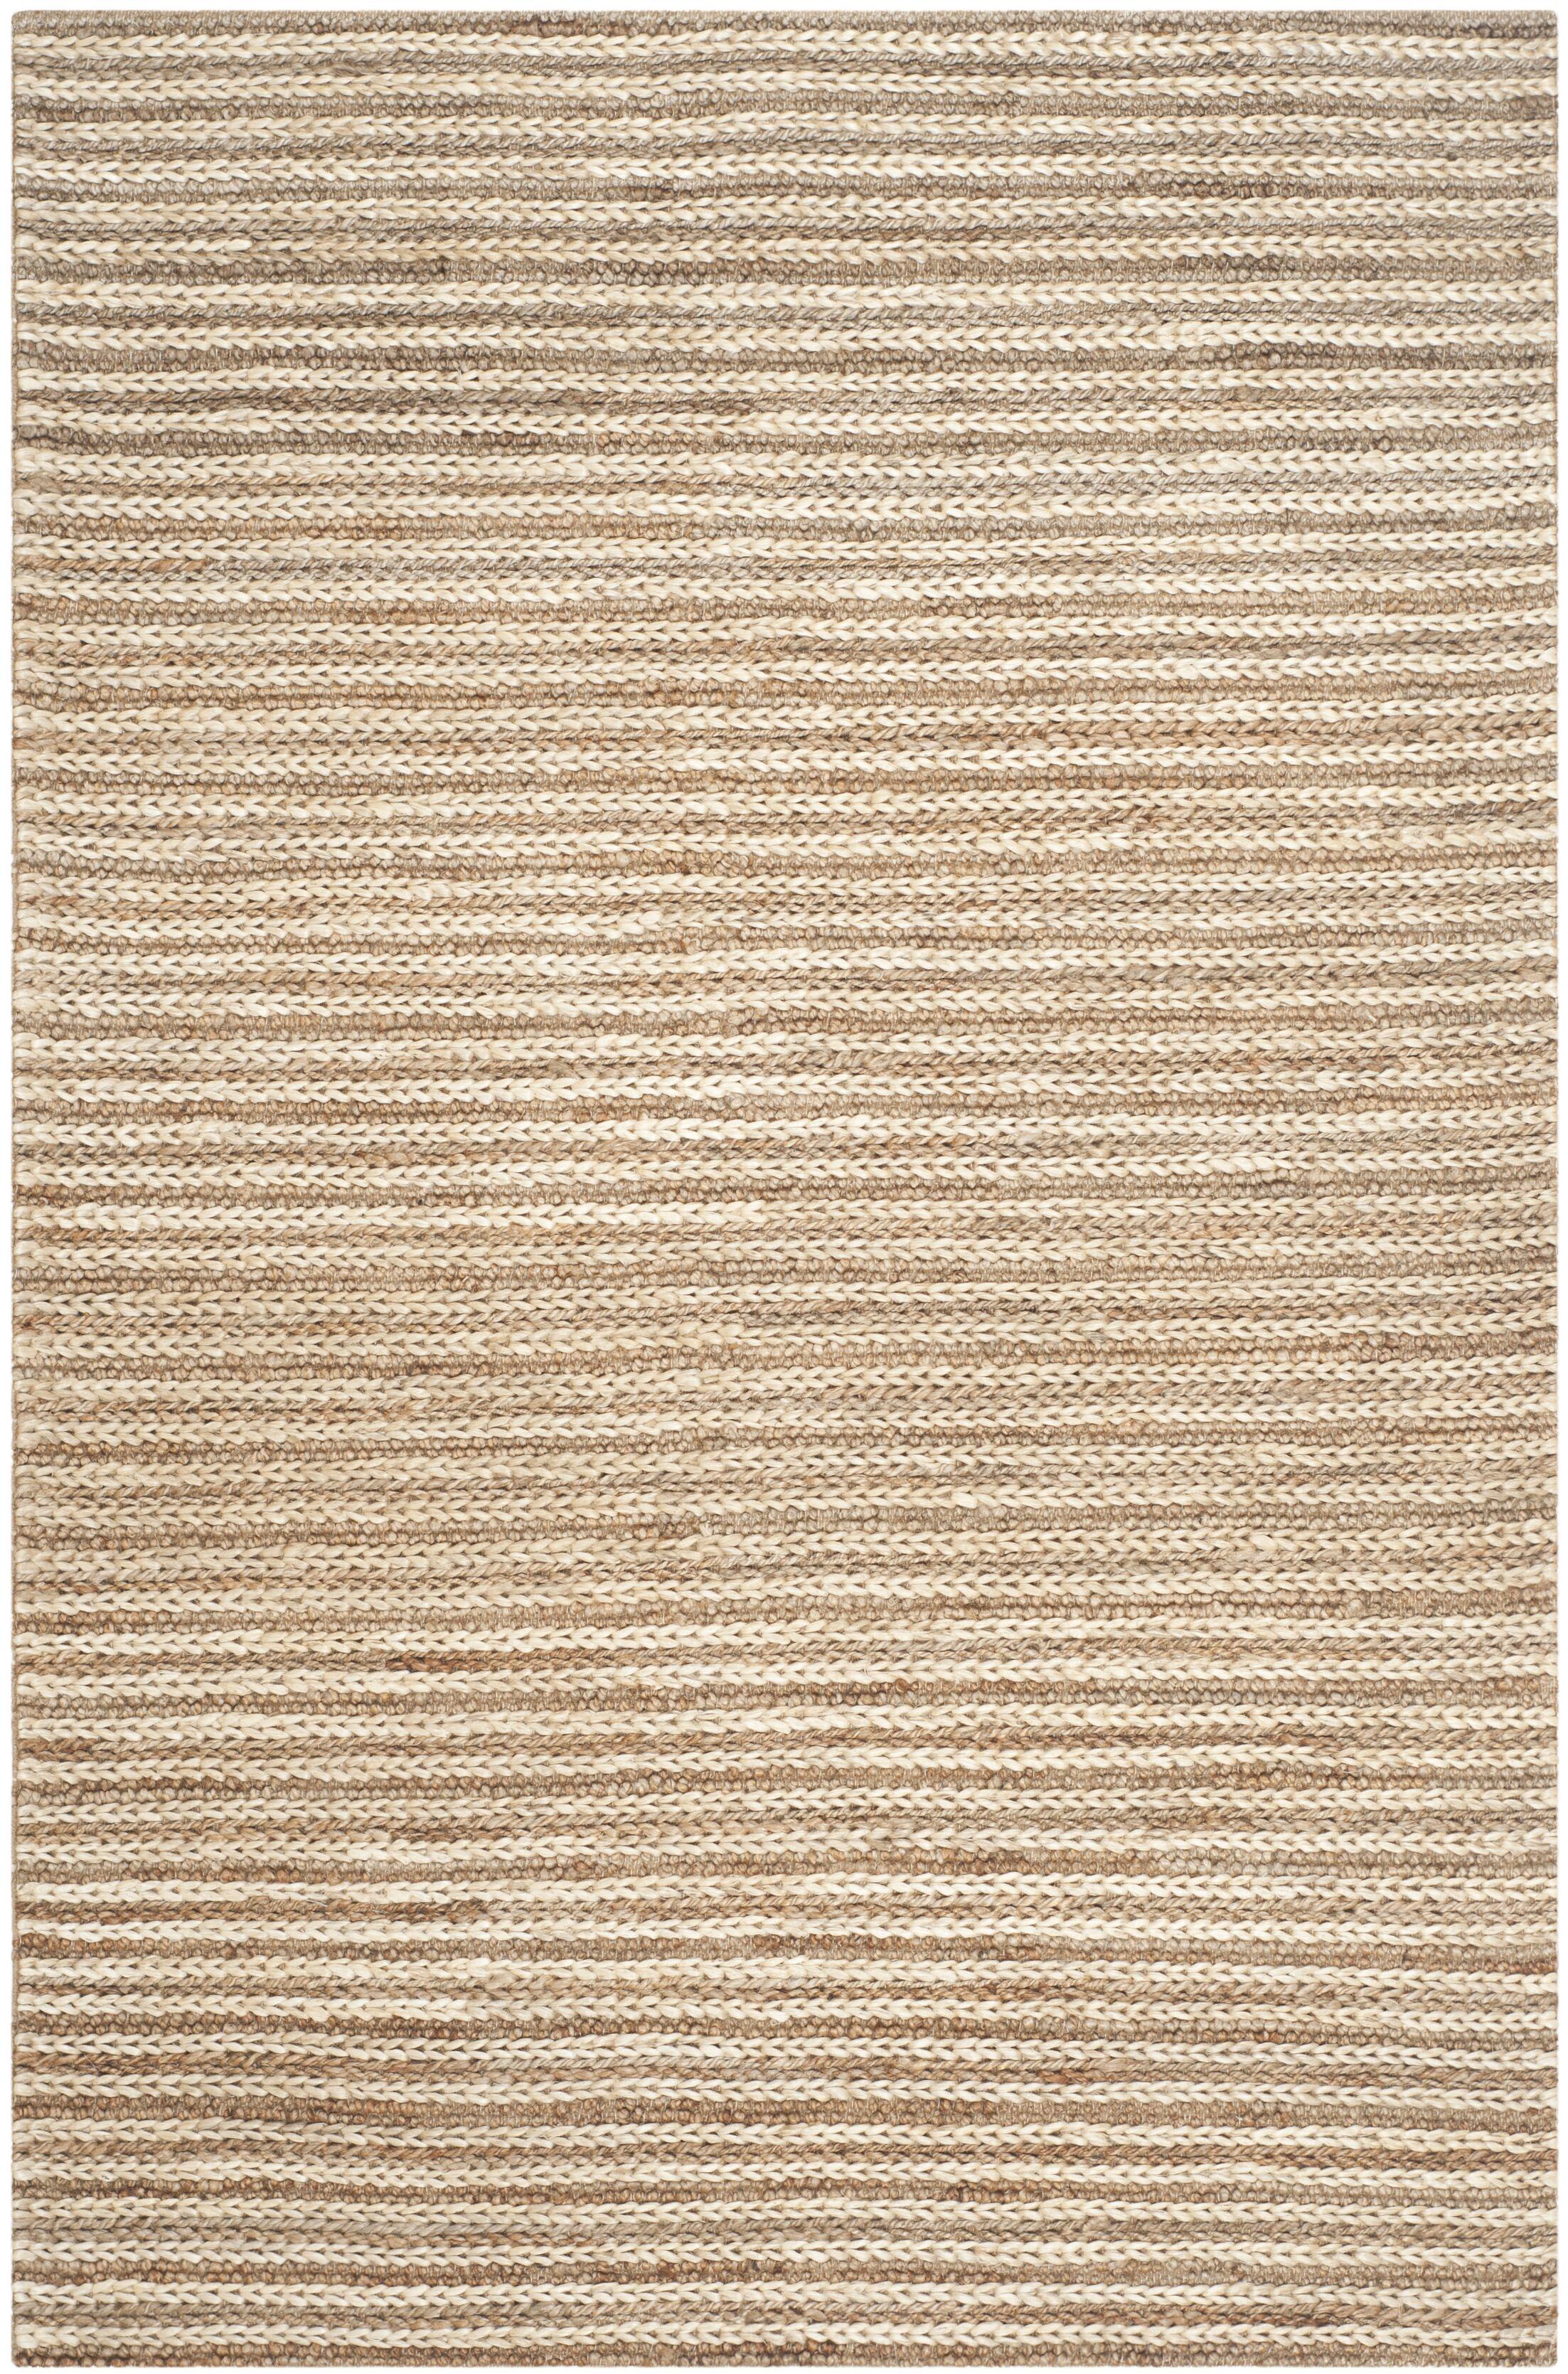 Hand-Woven Area Rug Rug Size: Rectangle 5' x 8'